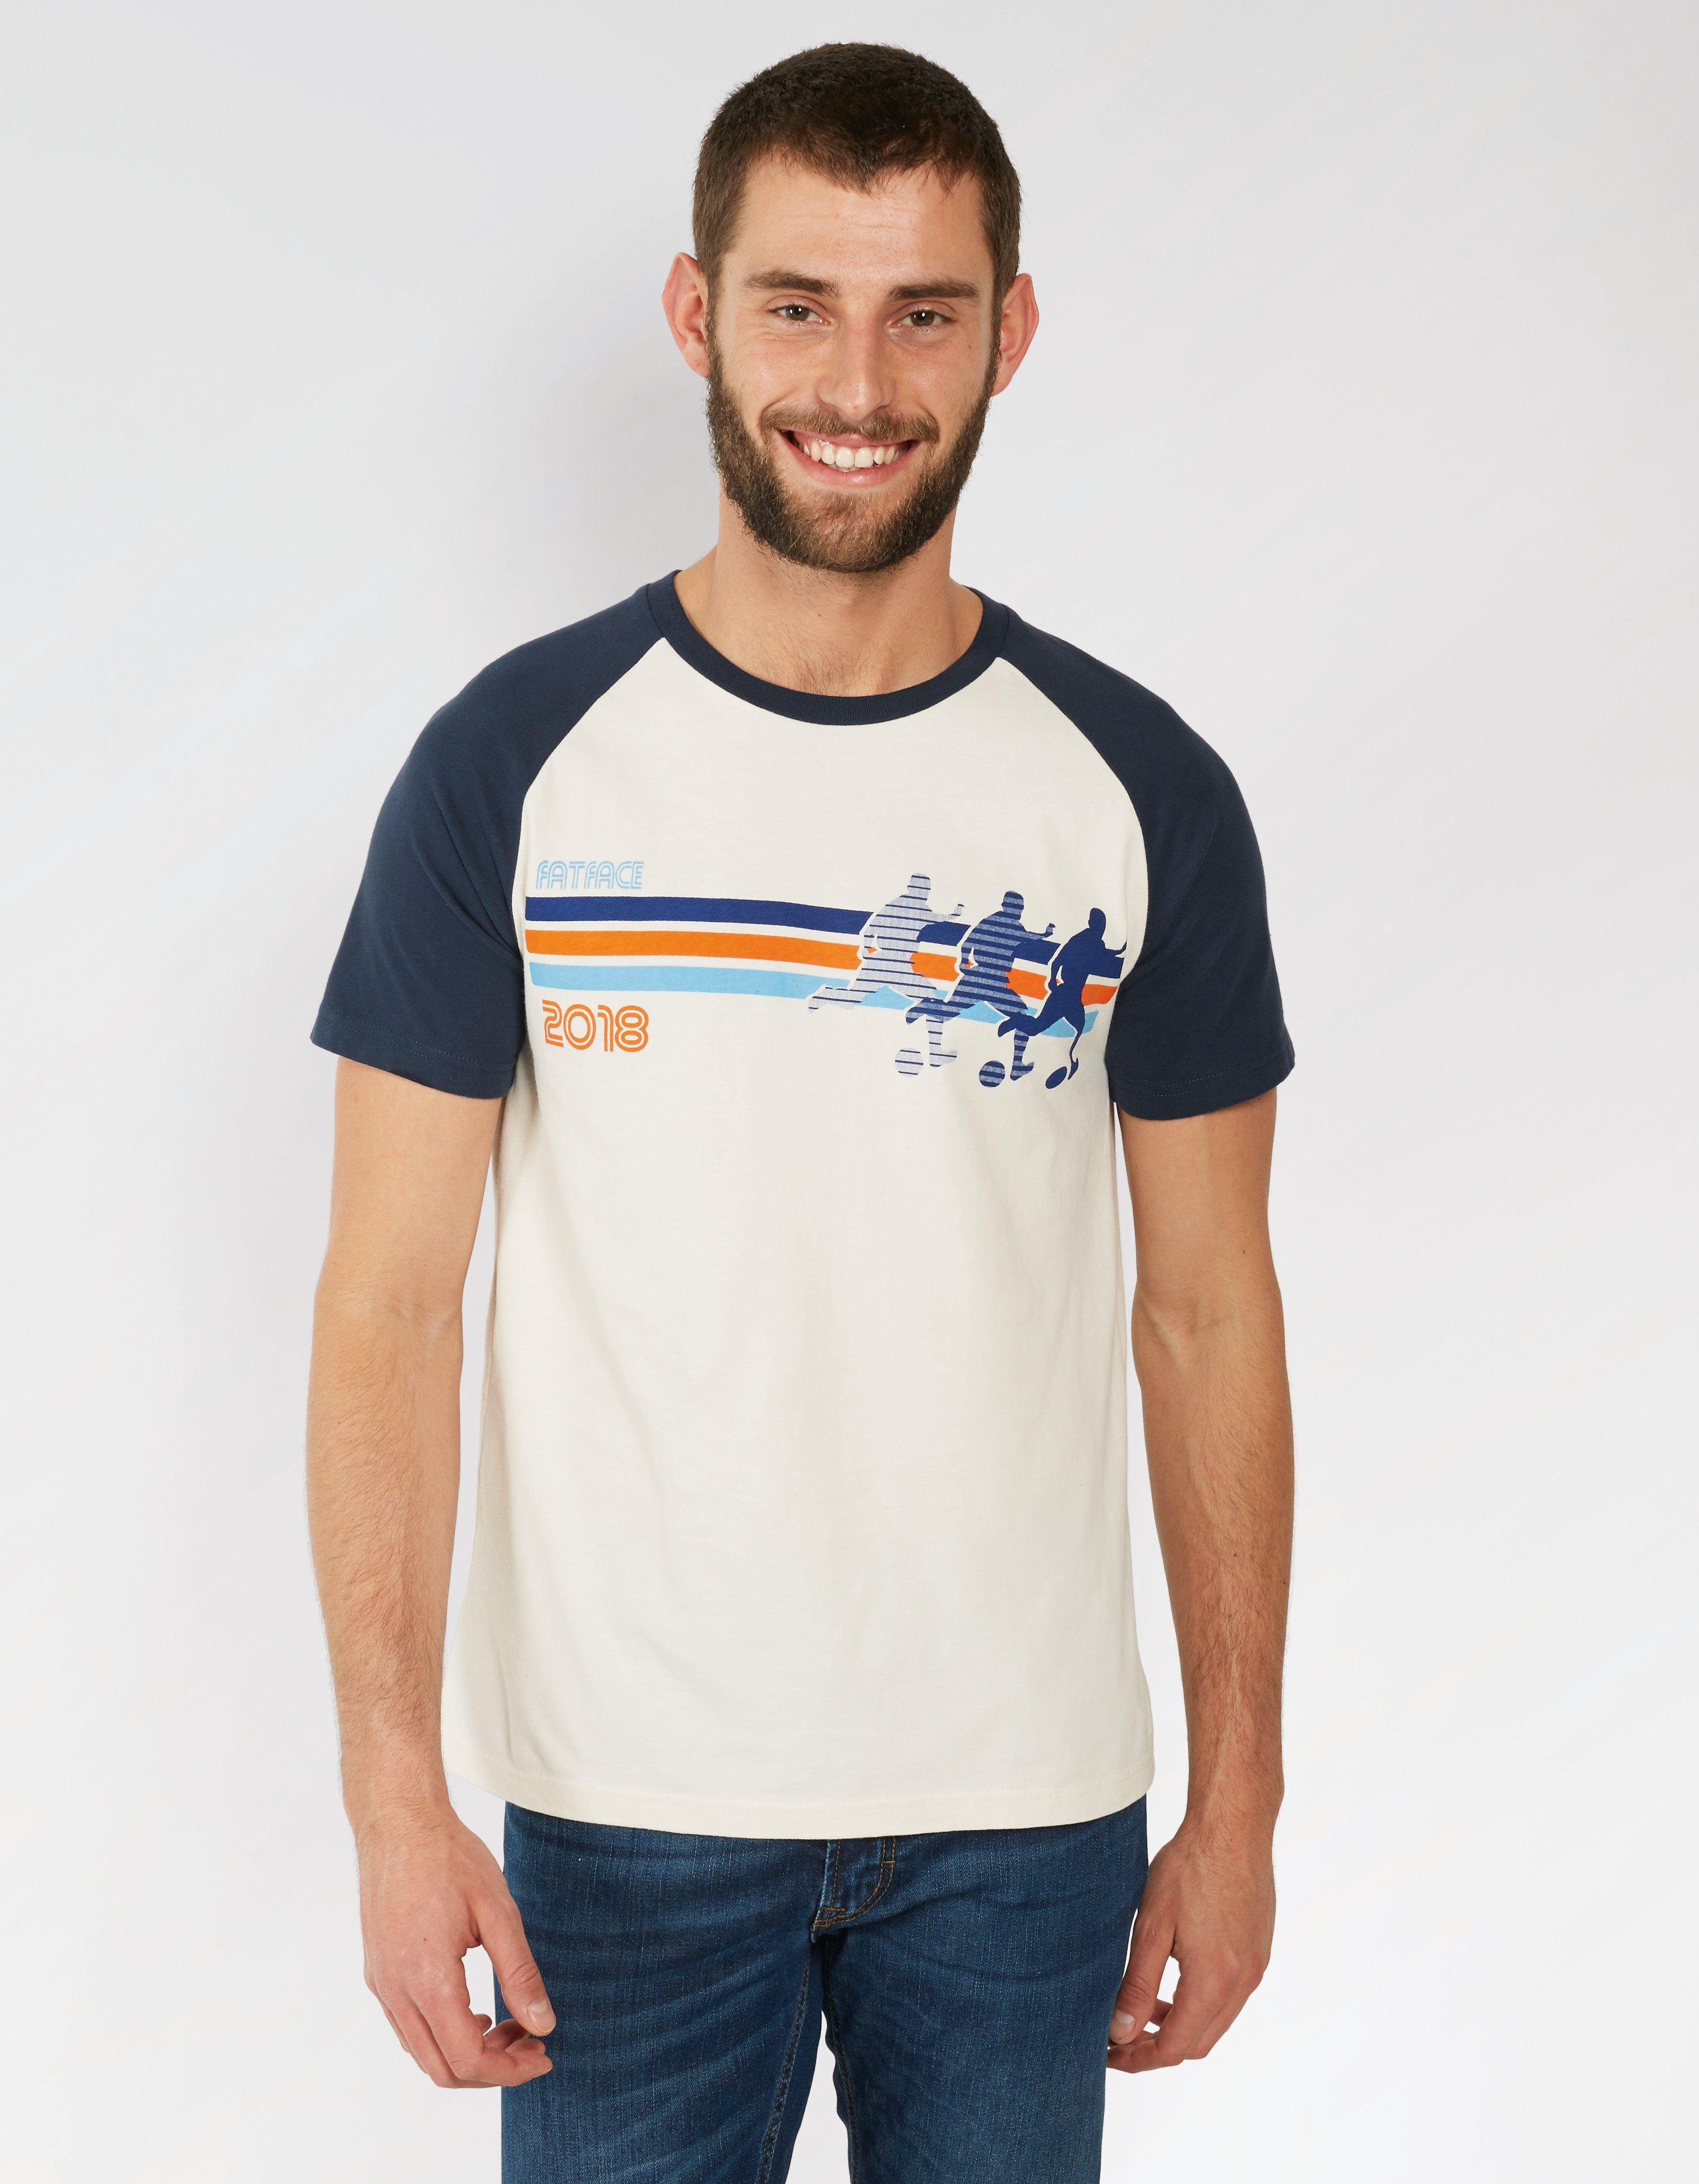 Football Organic Cotton Graphic T Shirt